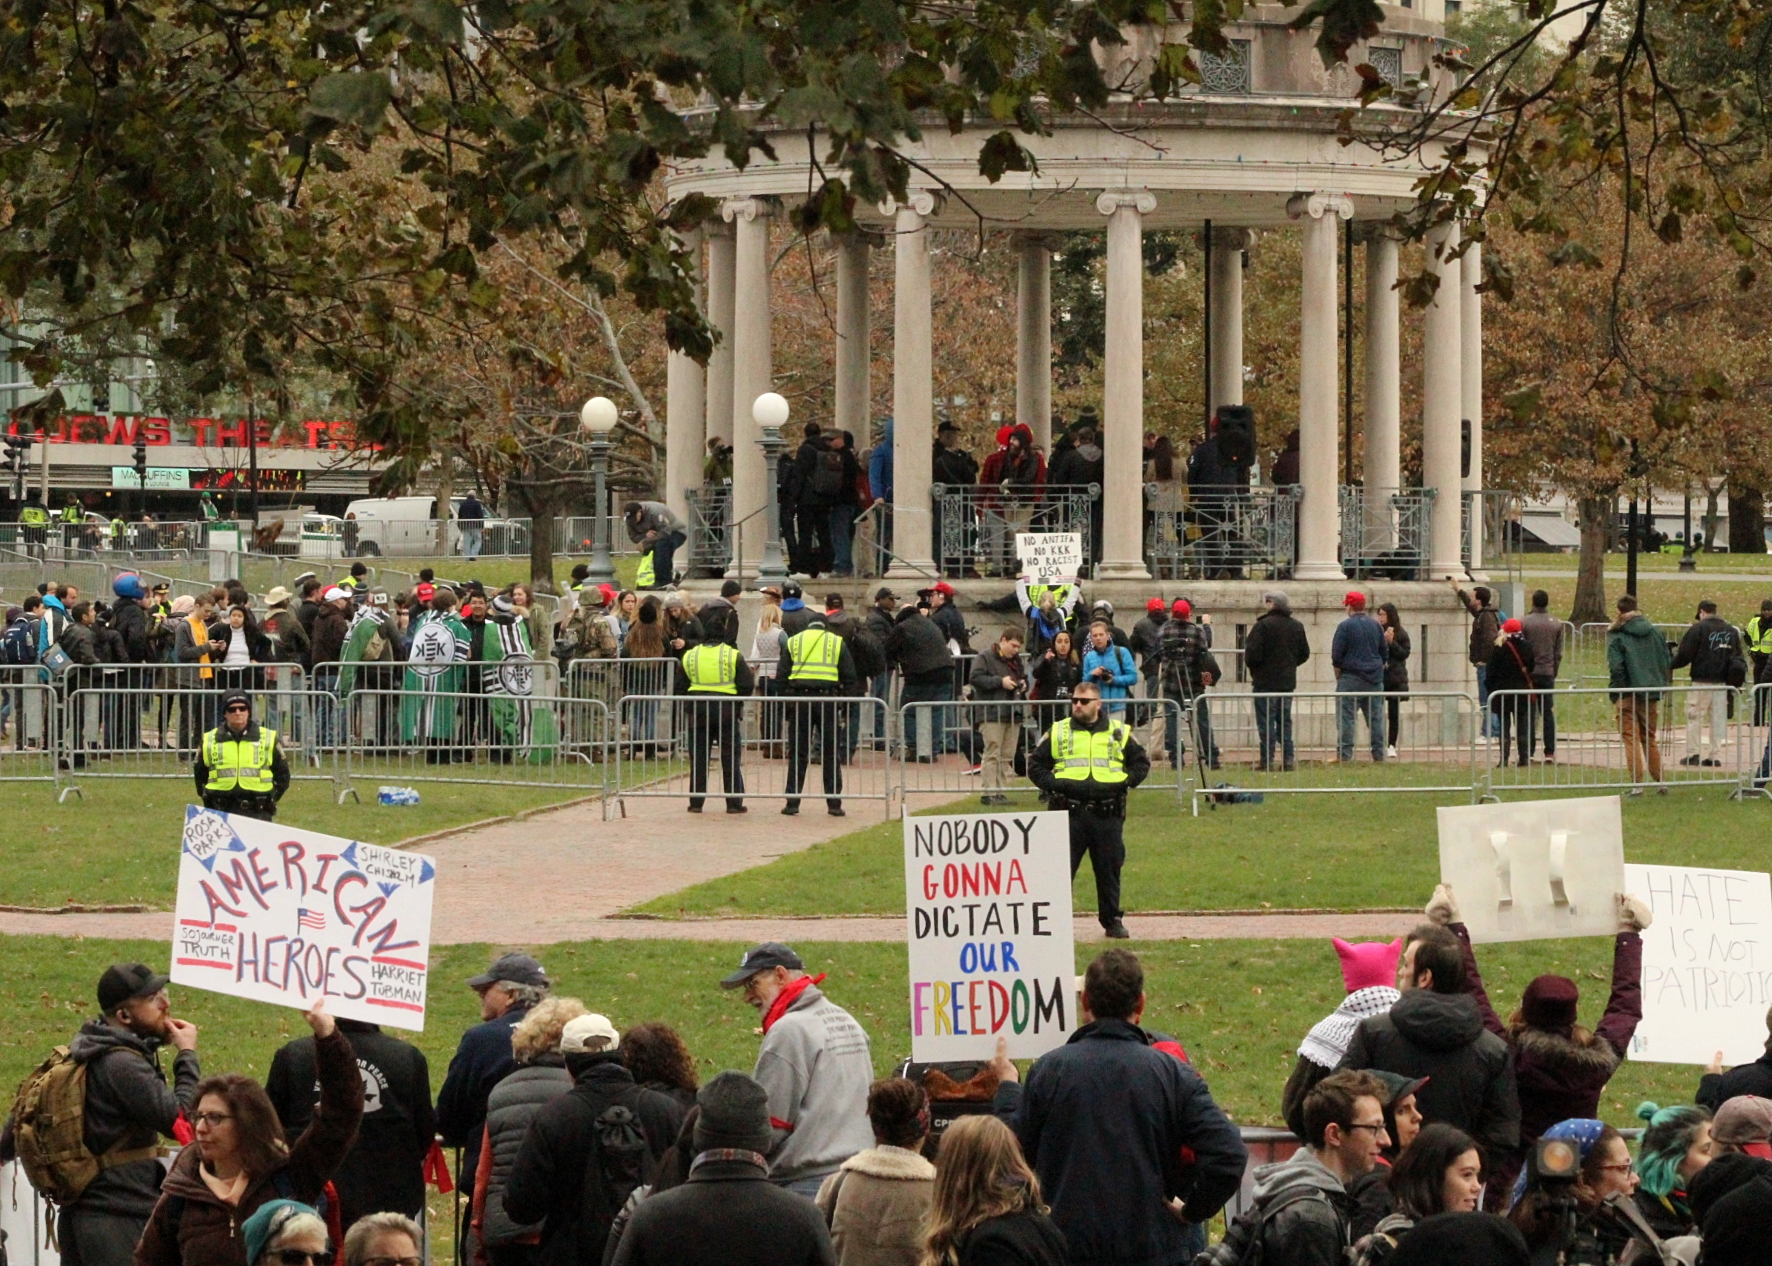 2017-11-18 Boston Common Free Speech Rally 17